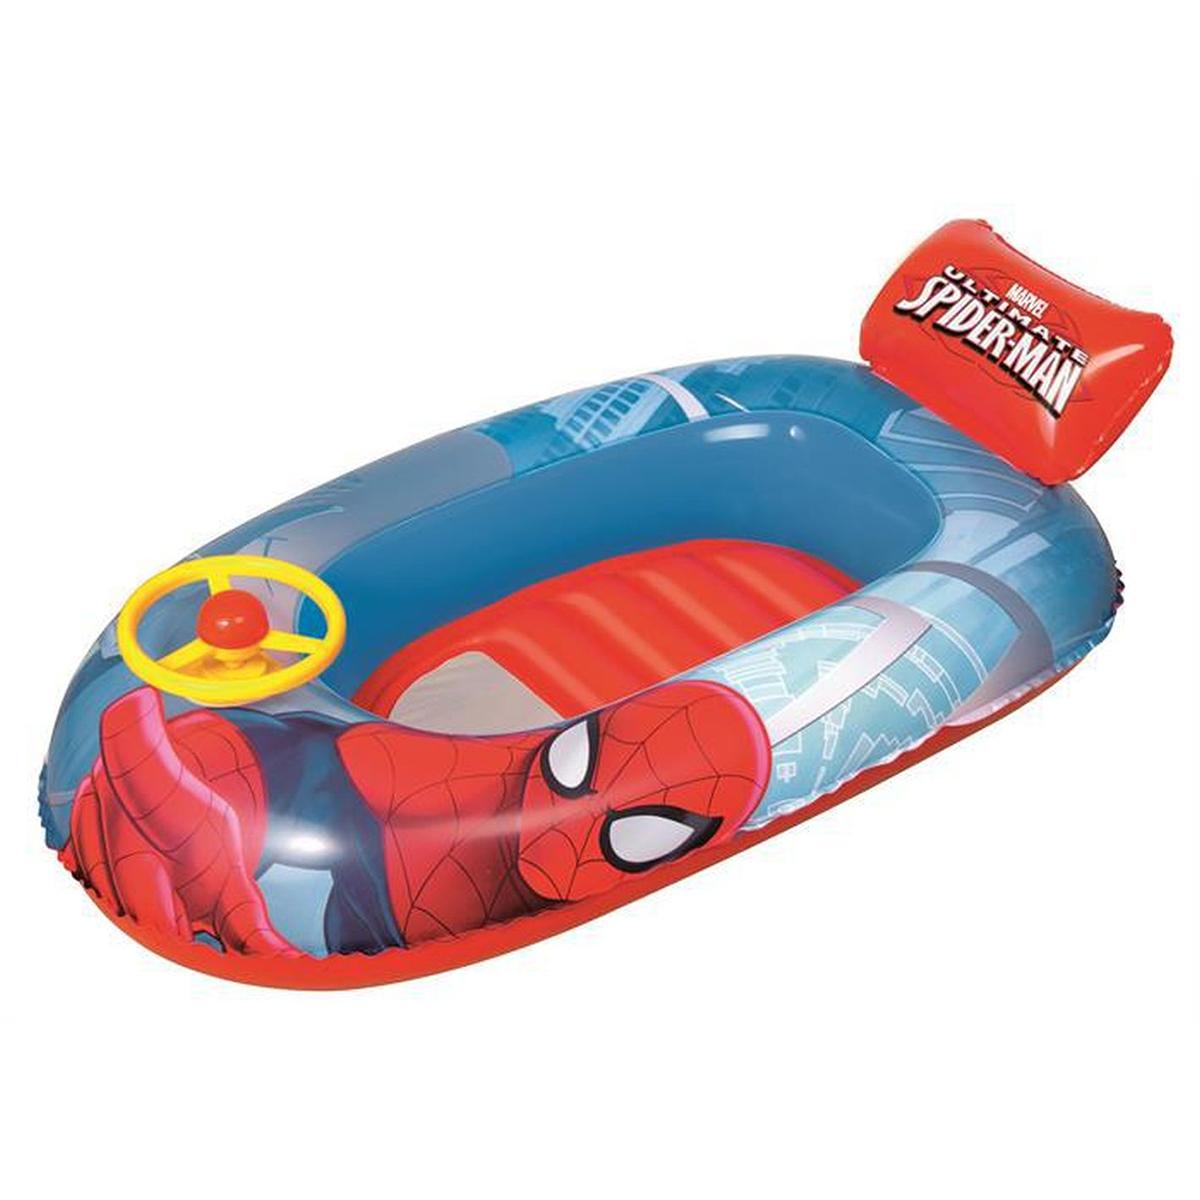 Barca gonflabila Bestway, Spiderman, 112 x 71 cm imagine